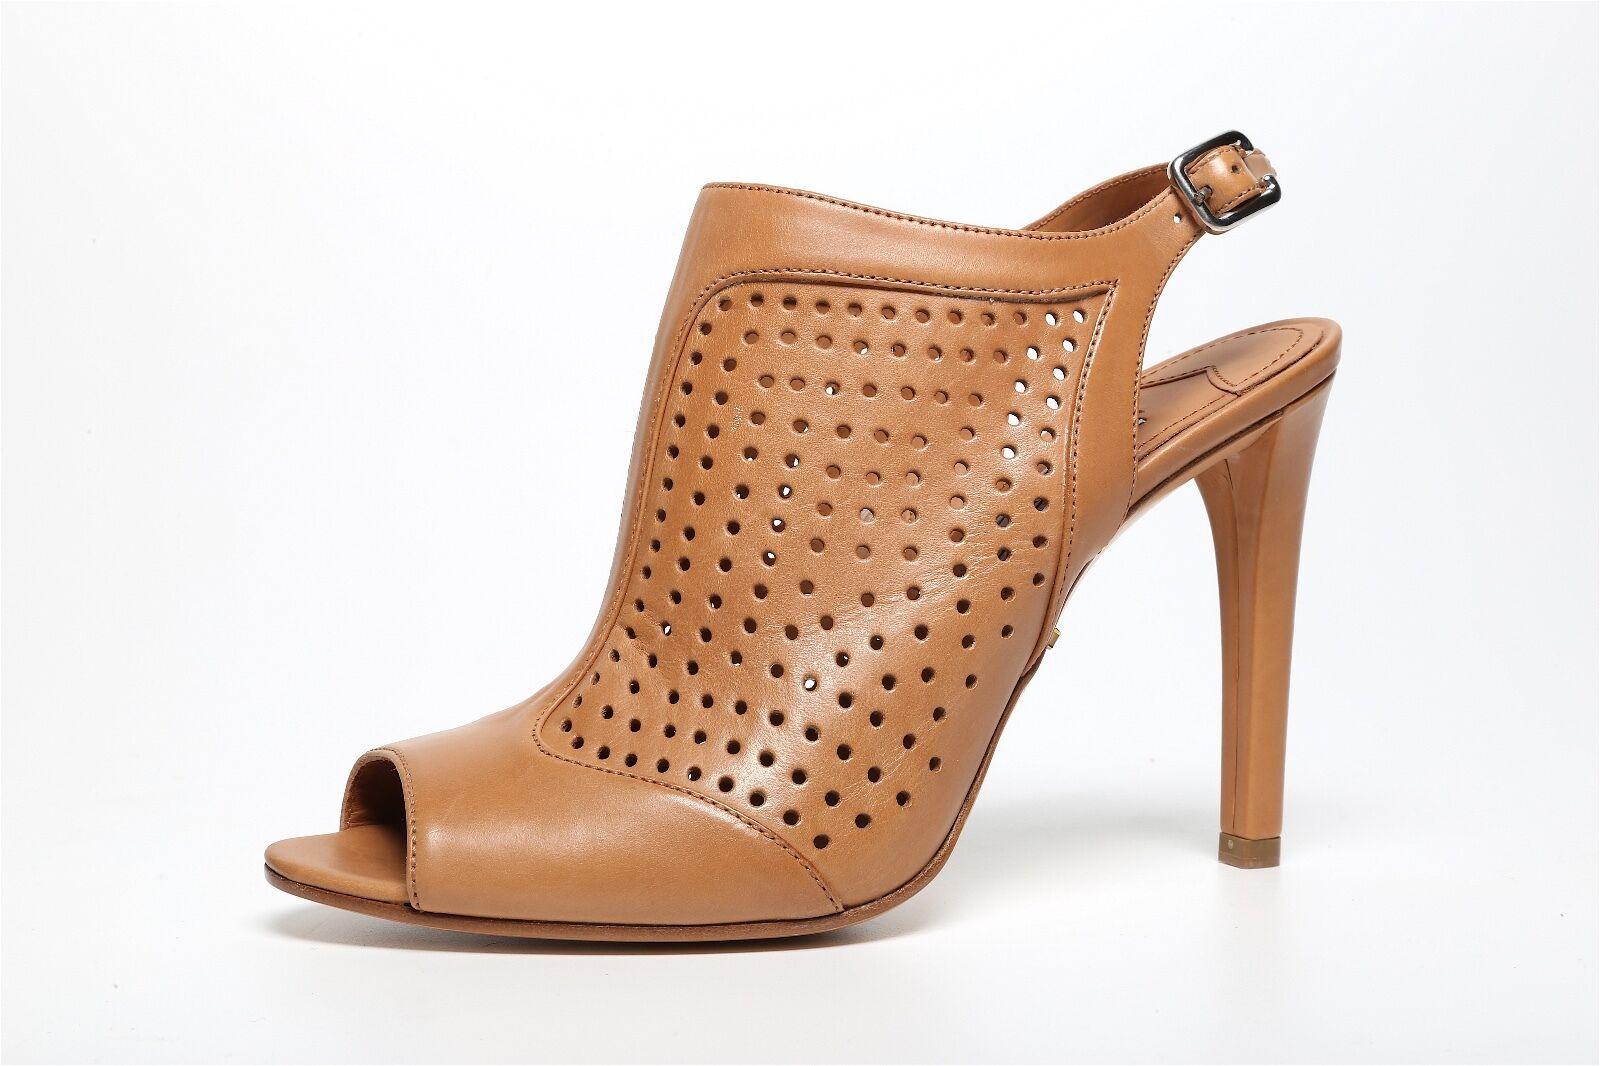 Prada Women's Brown Leather Perforated Peep Toe Bootie 2899 Sz 38 EUR